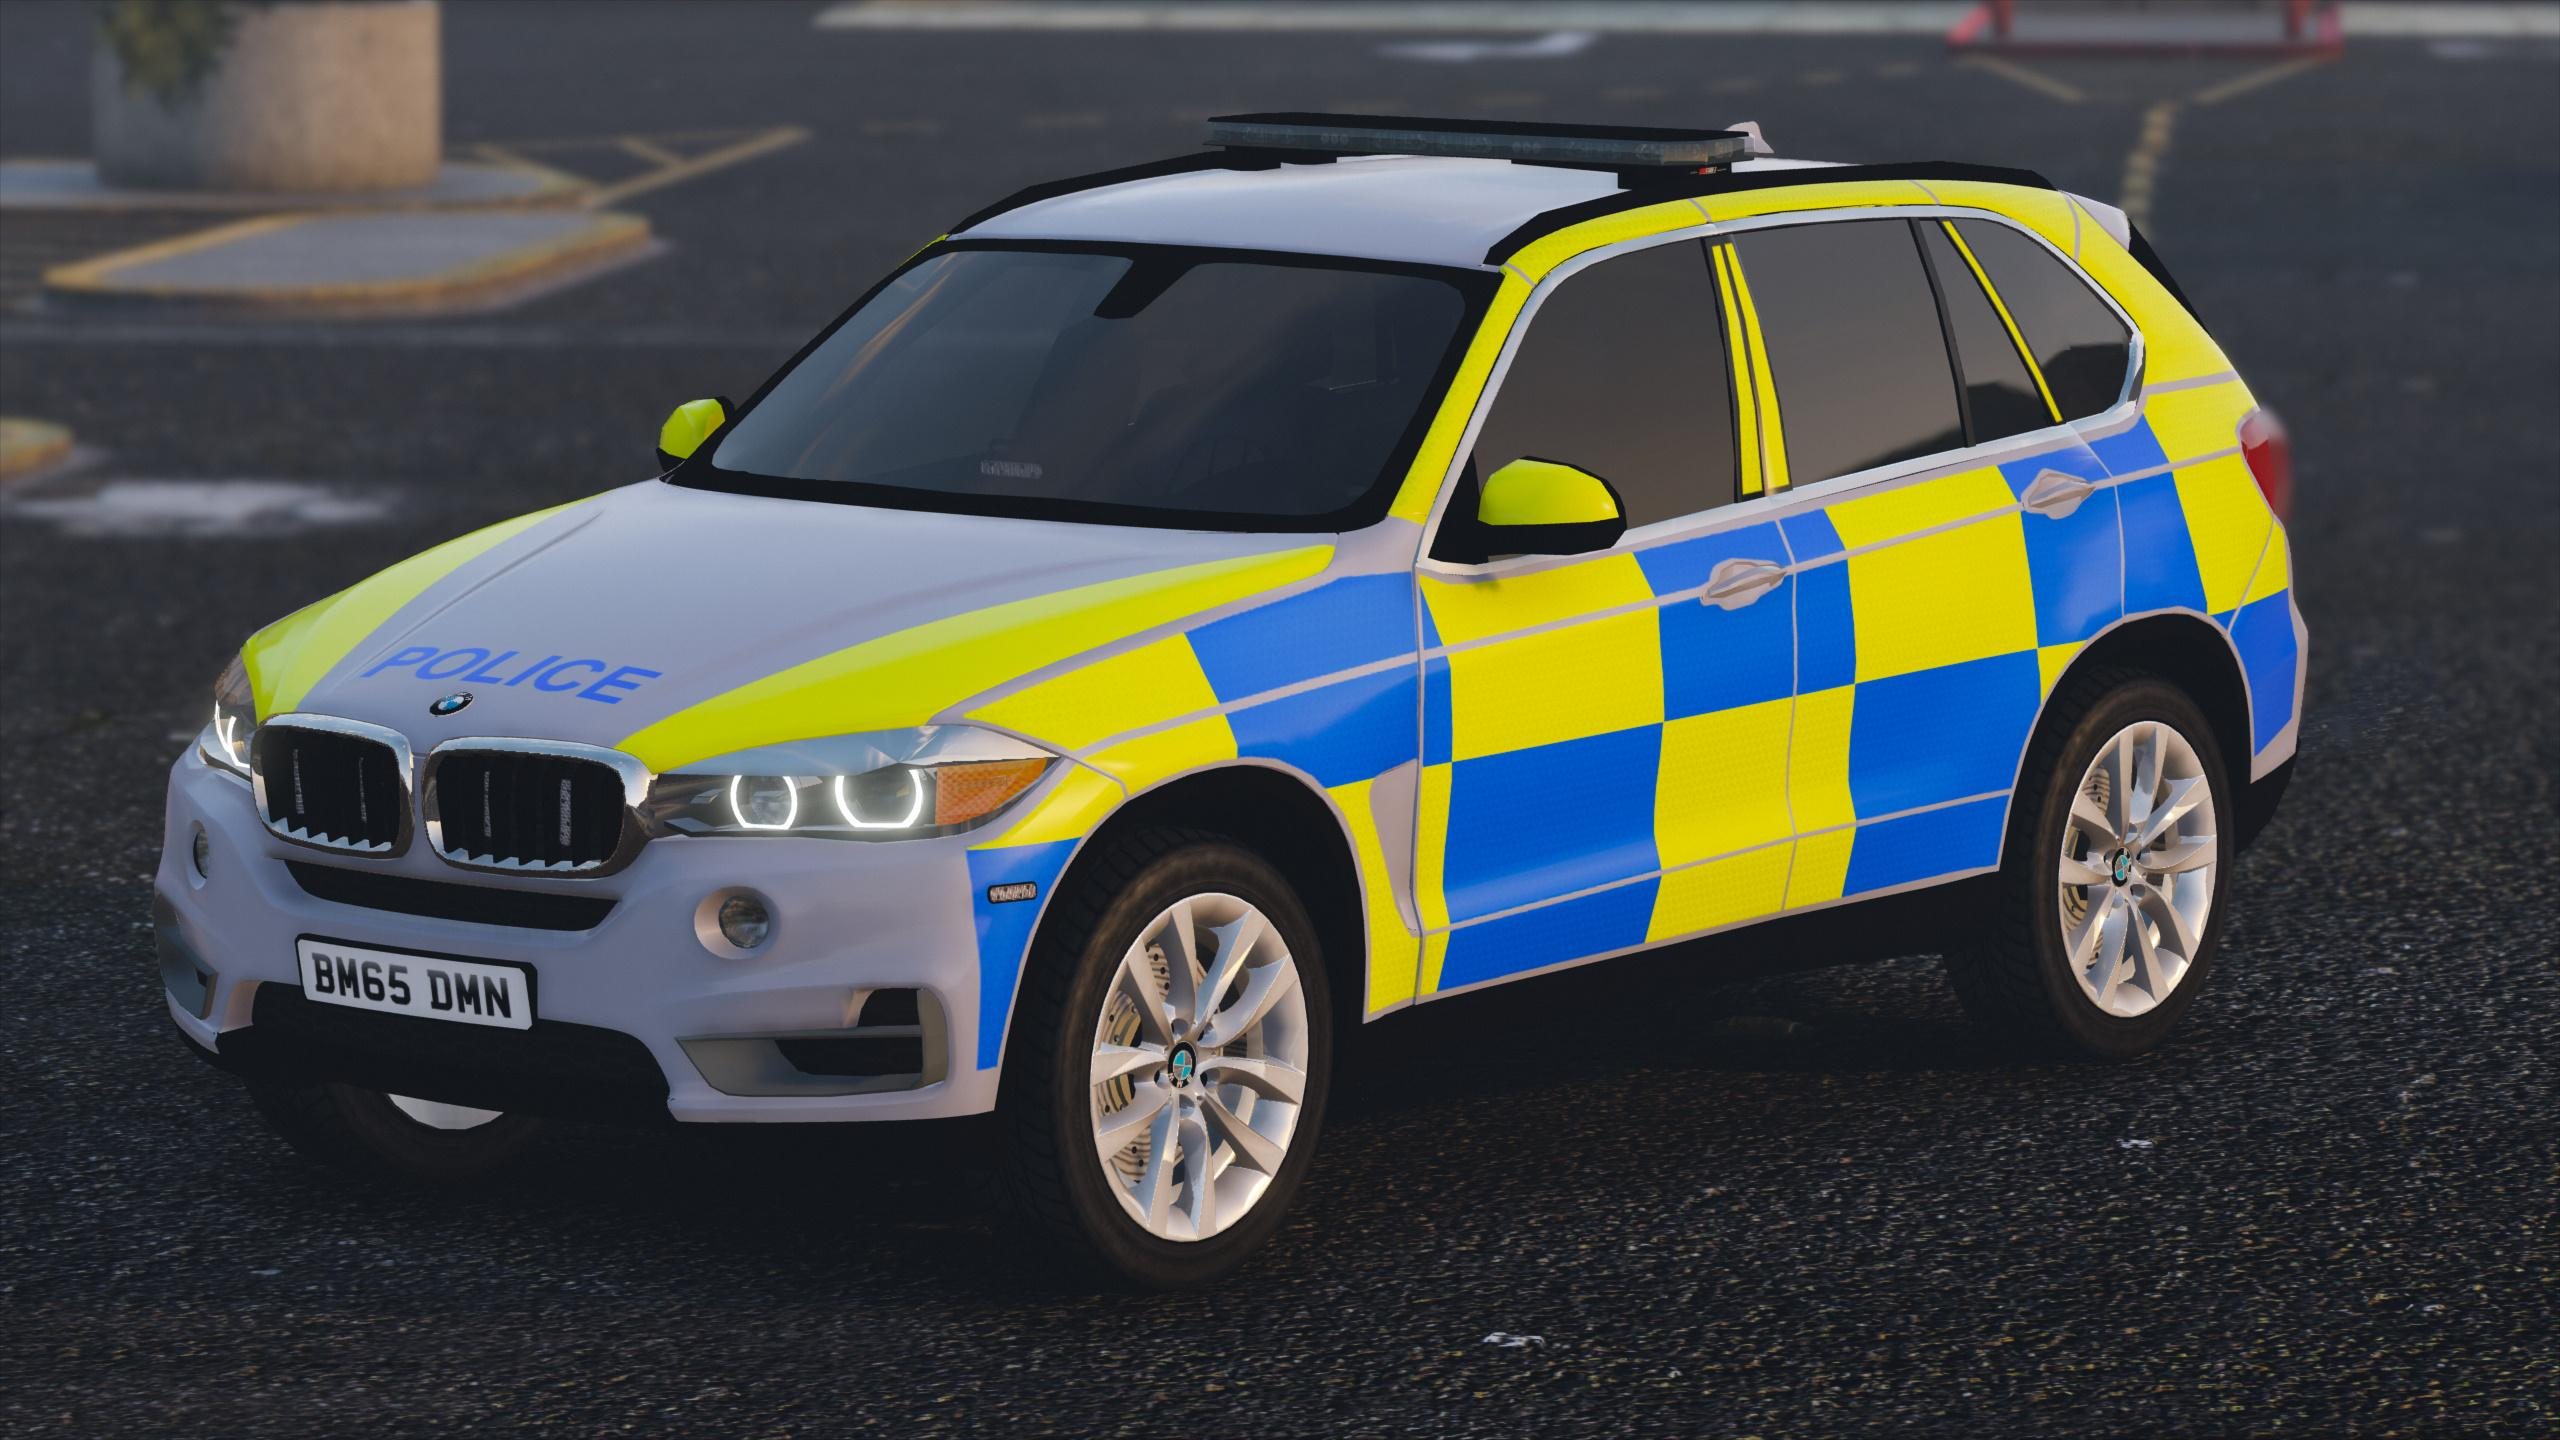 2015 Police Bmw X5 Gta5 Mods Com